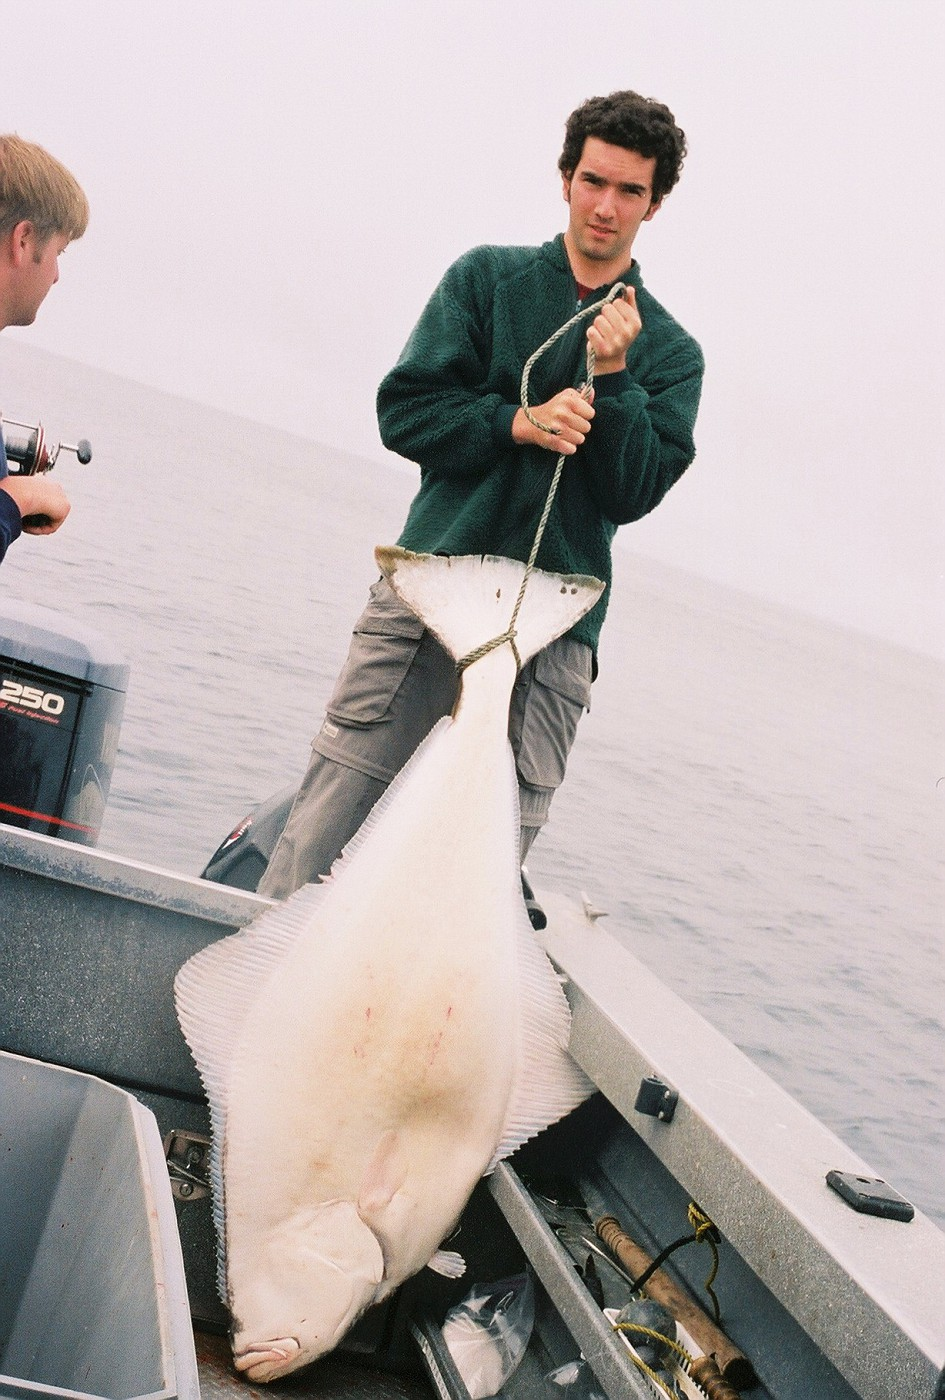 Nice size halibut